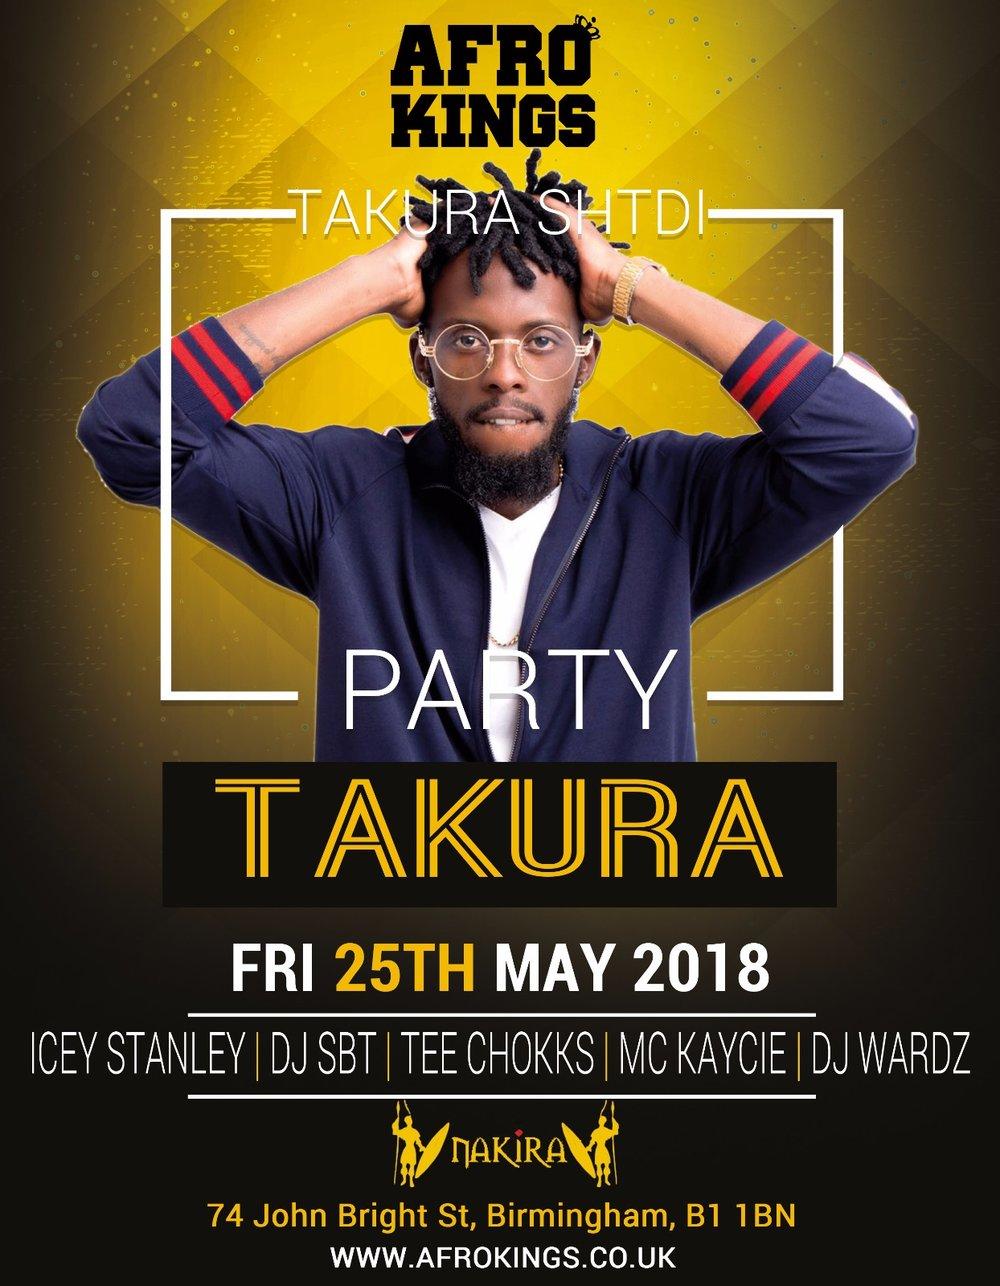 Takura Welcome Party.jpeg